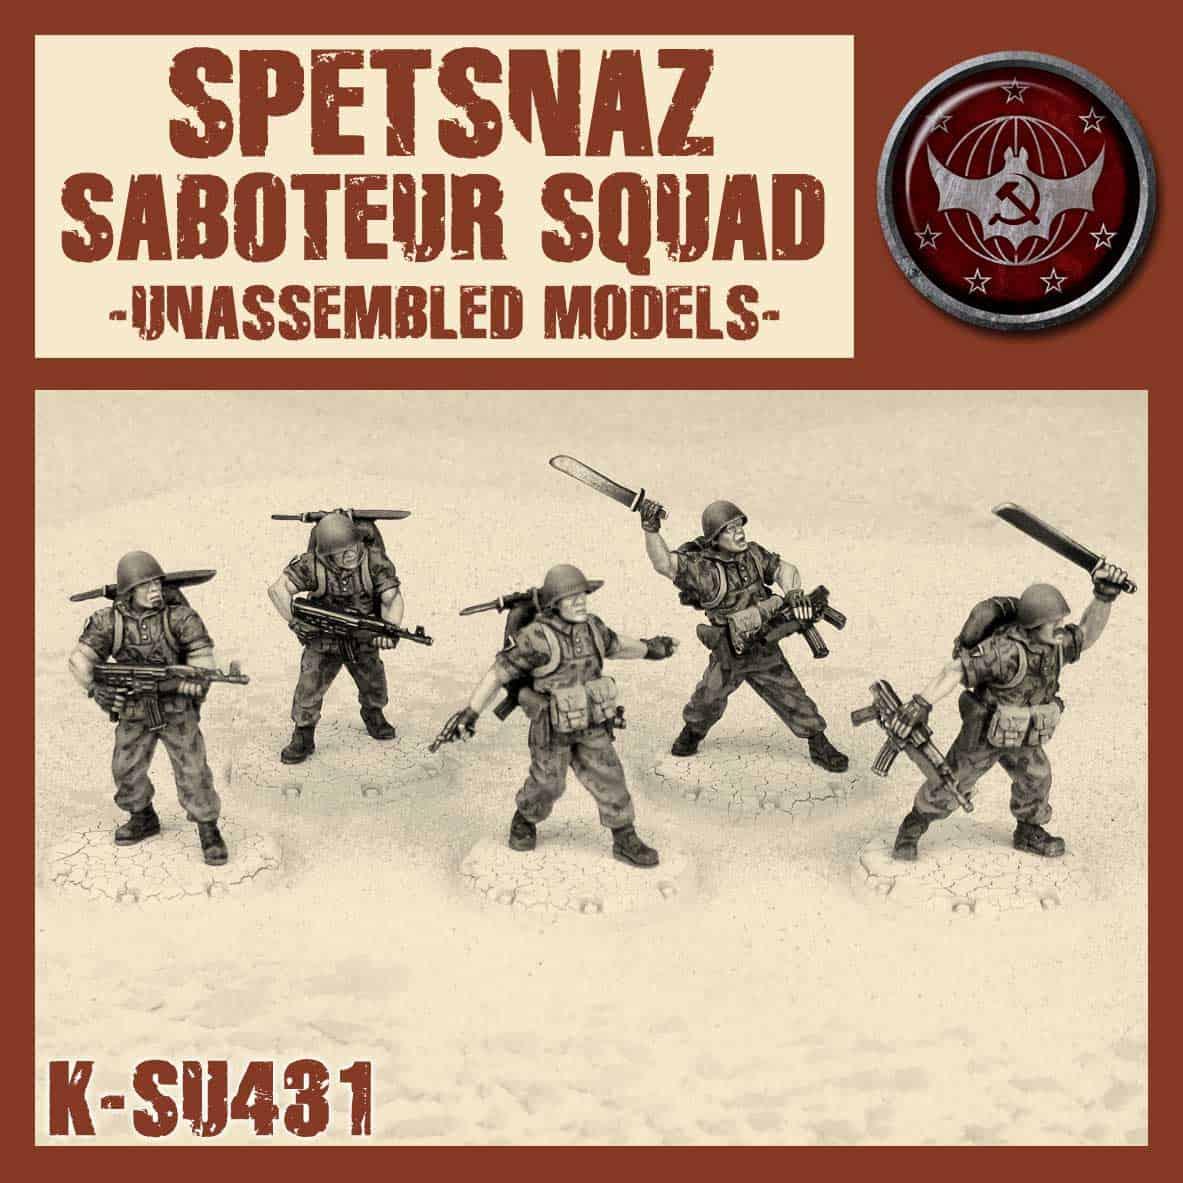 Spetsnaz Saboteur Squad Kit